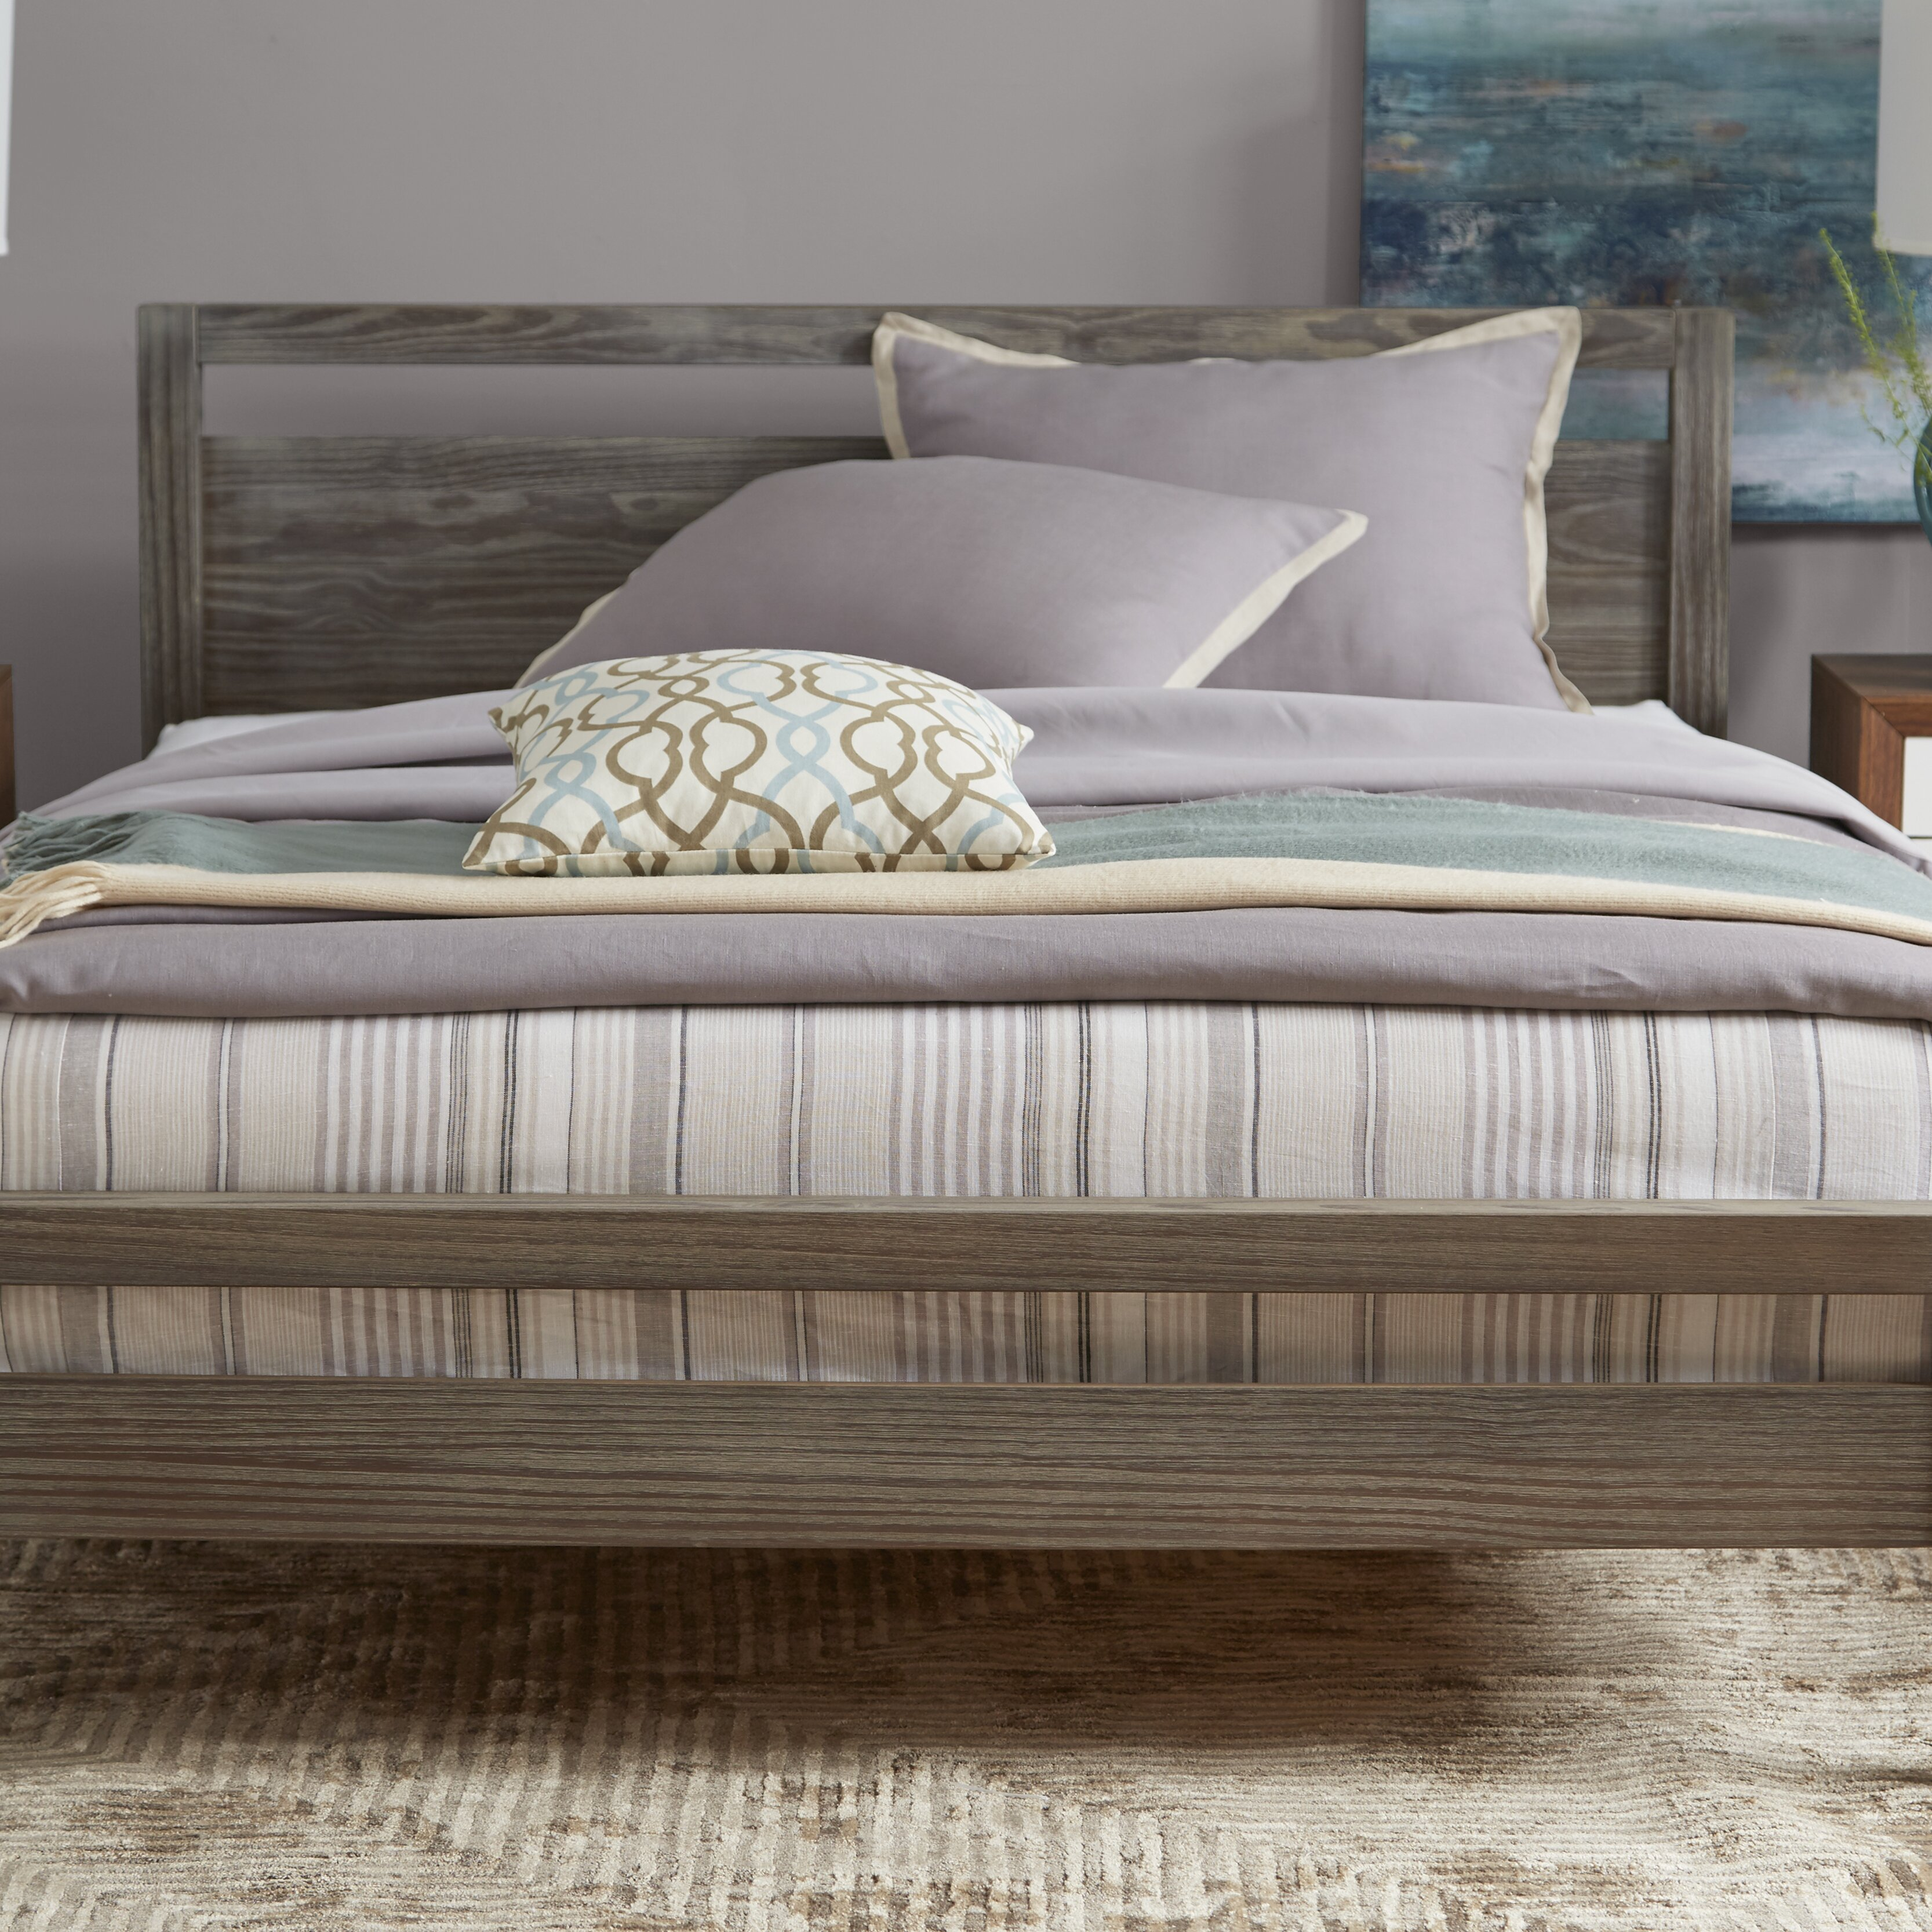 Aico Hollywood Loft Frost Upholstered Platform Bed 9001600ckbed 104 In - Grain wood furniture loft queen platform bed reviews wayfair